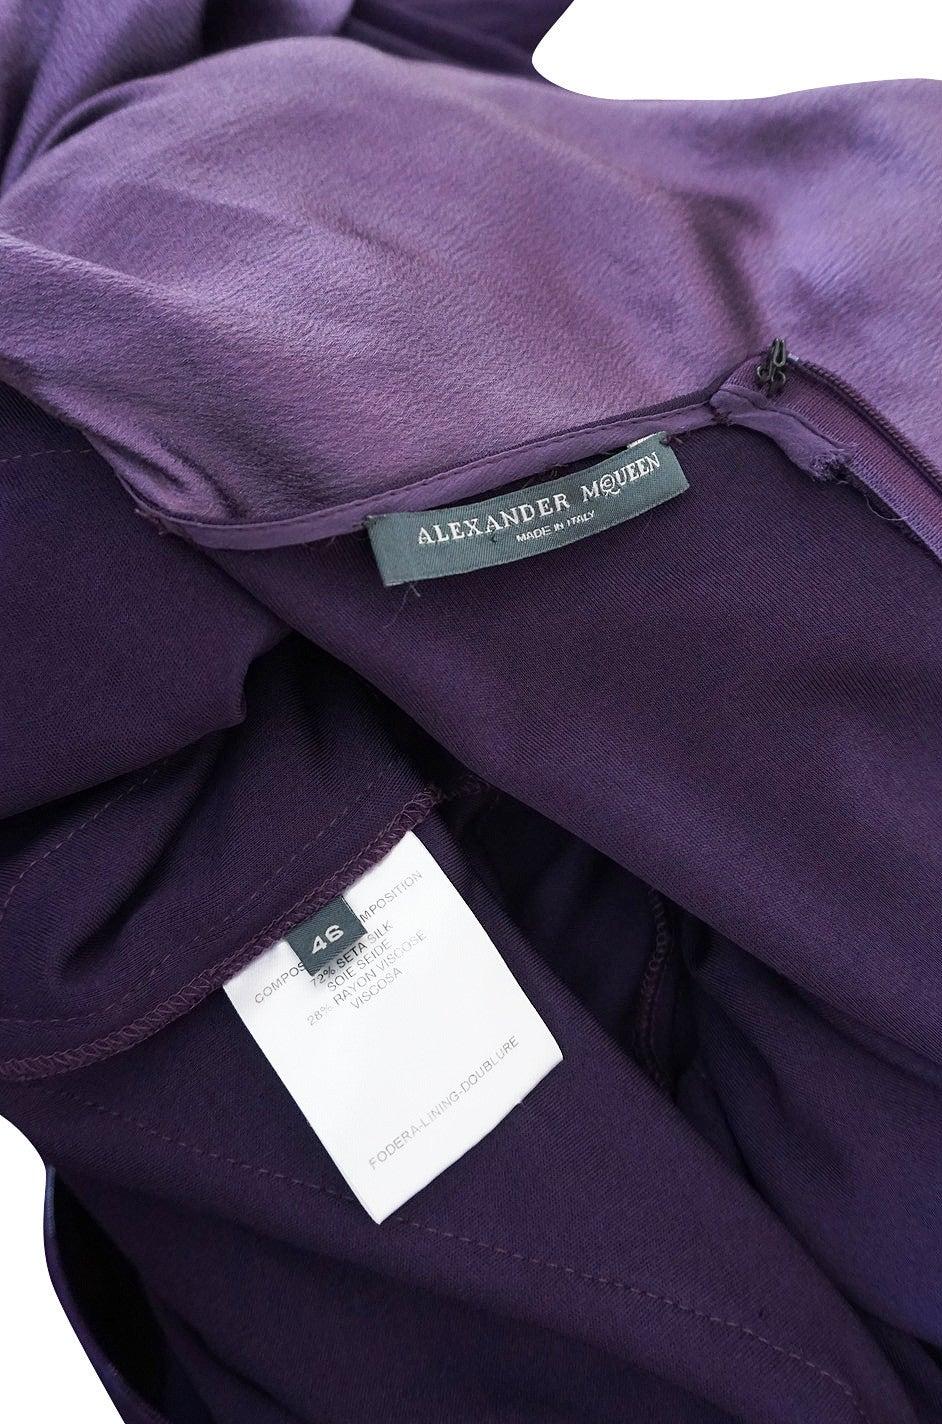 2004 F/W Alexander McQueen Purple Tie Runway Dress For Sale 1